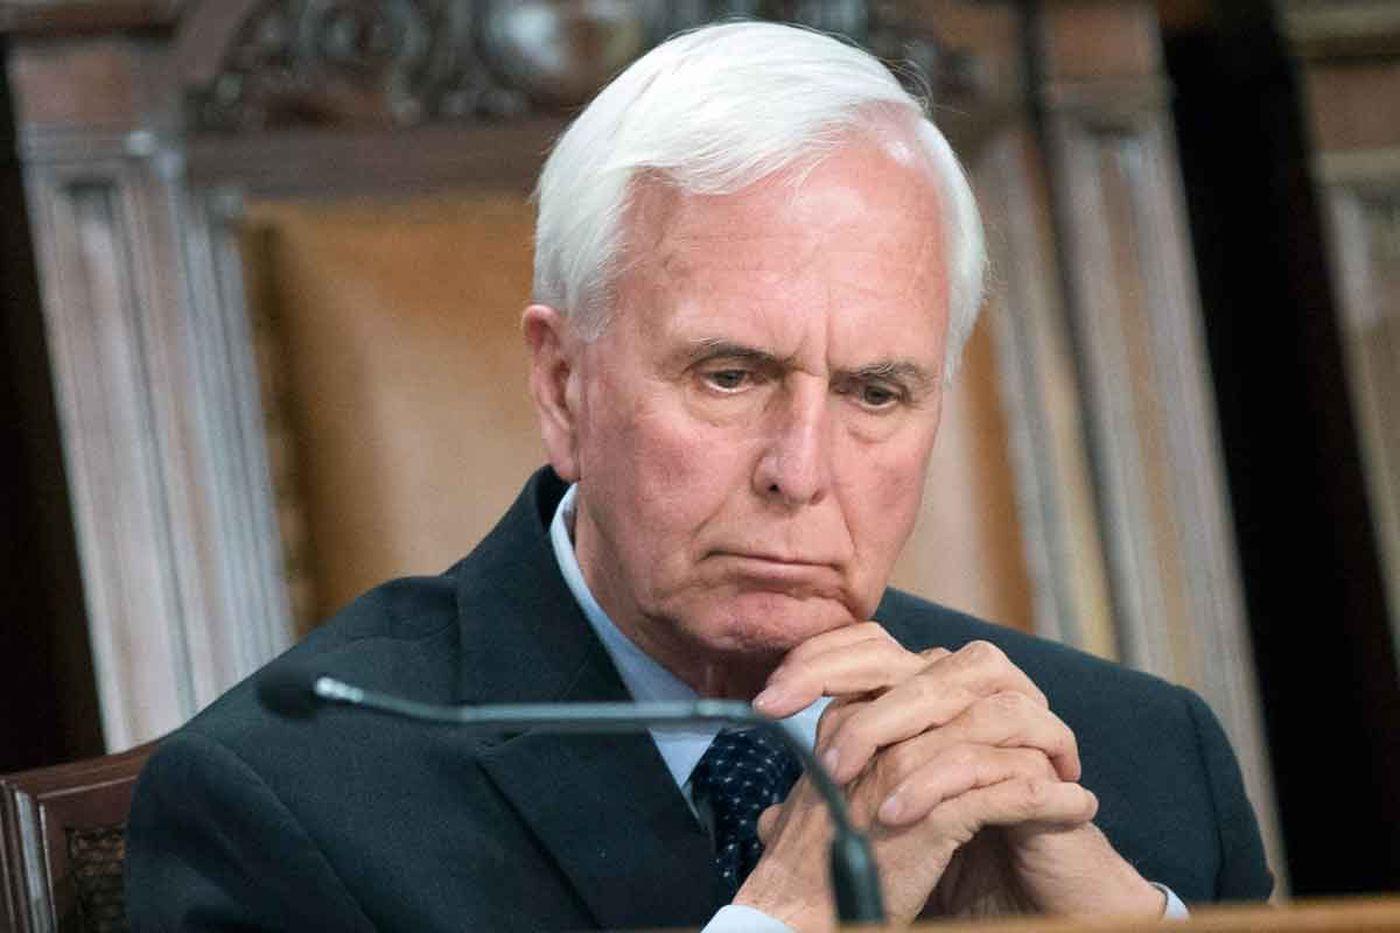 Pa. Sen. Stewart Greenleaf, longtime Montco legislator, won't seek reelection